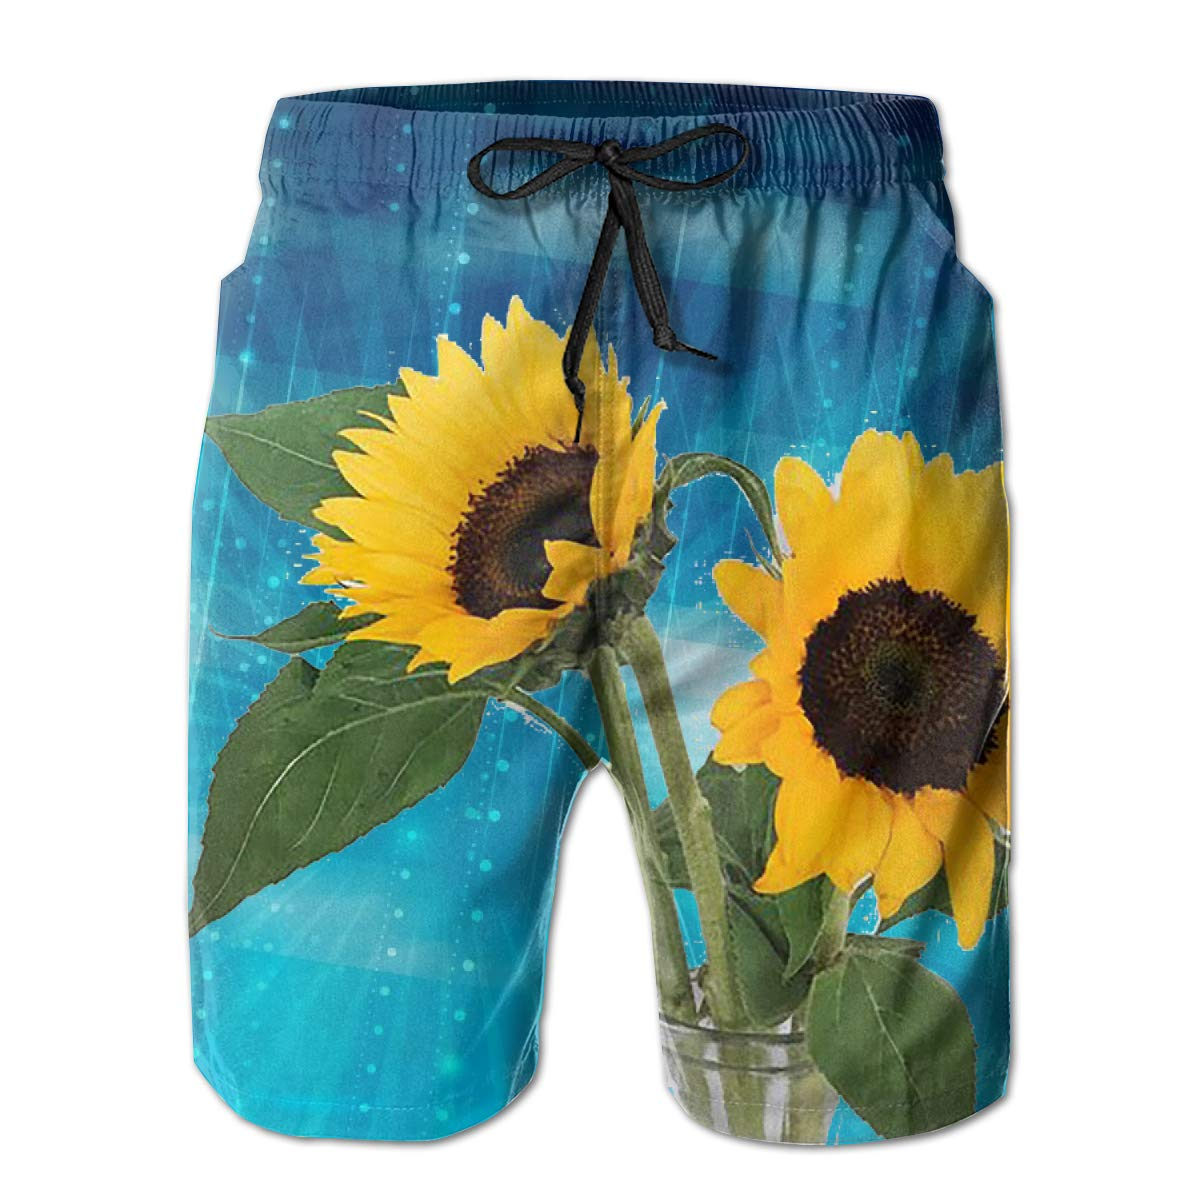 Oiyucv Mens Swim Trunks Yellow Sunflower Quick Dry Board Shorts Bathing Suits Swimwear Volley Beach Trunks